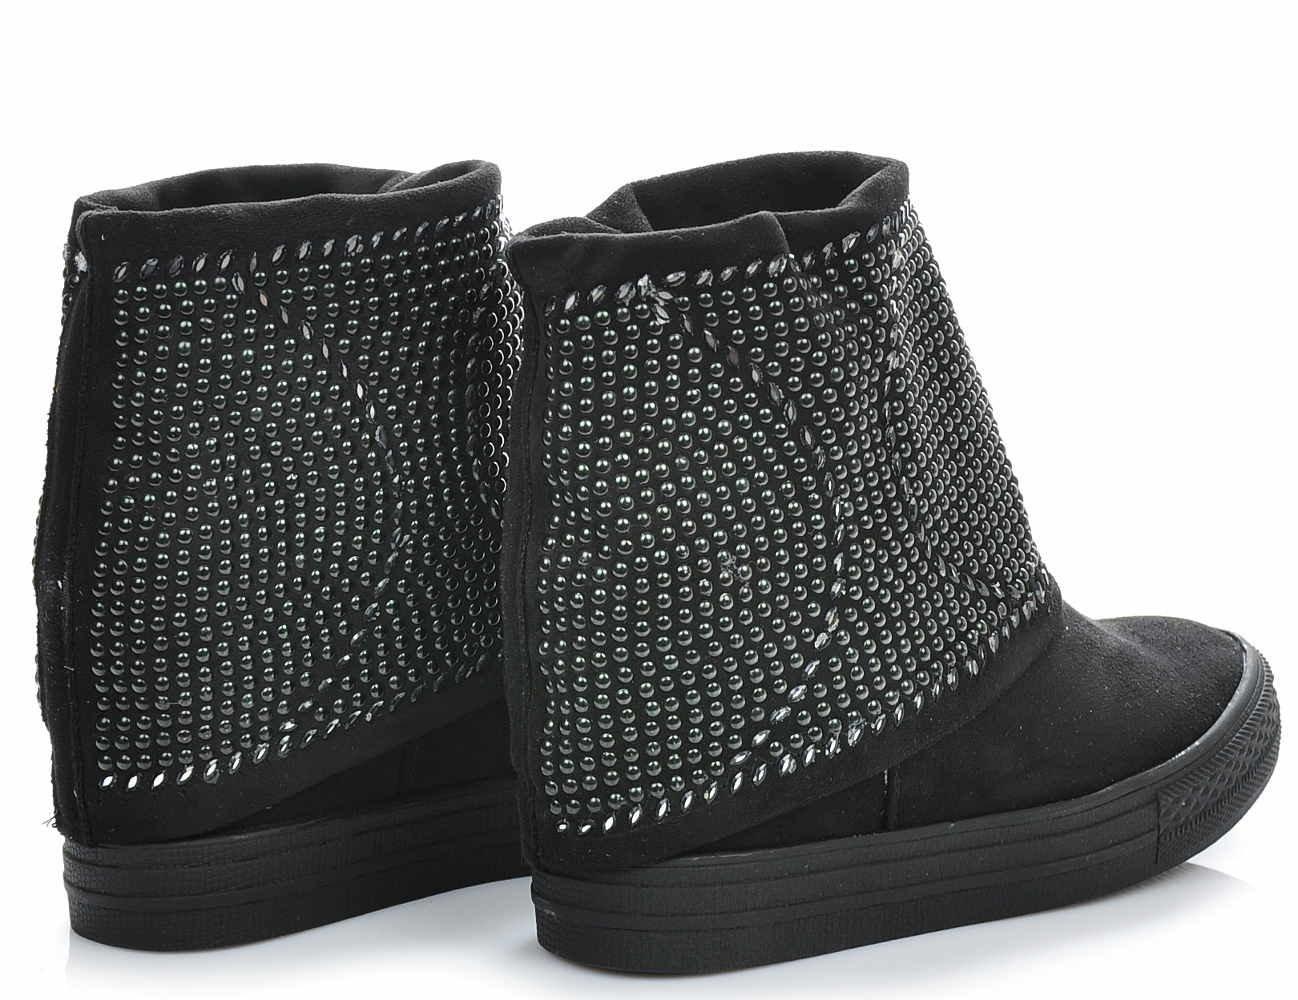 Pantofelek24.pl , Czarne sneakersy na koturnie z cekinami